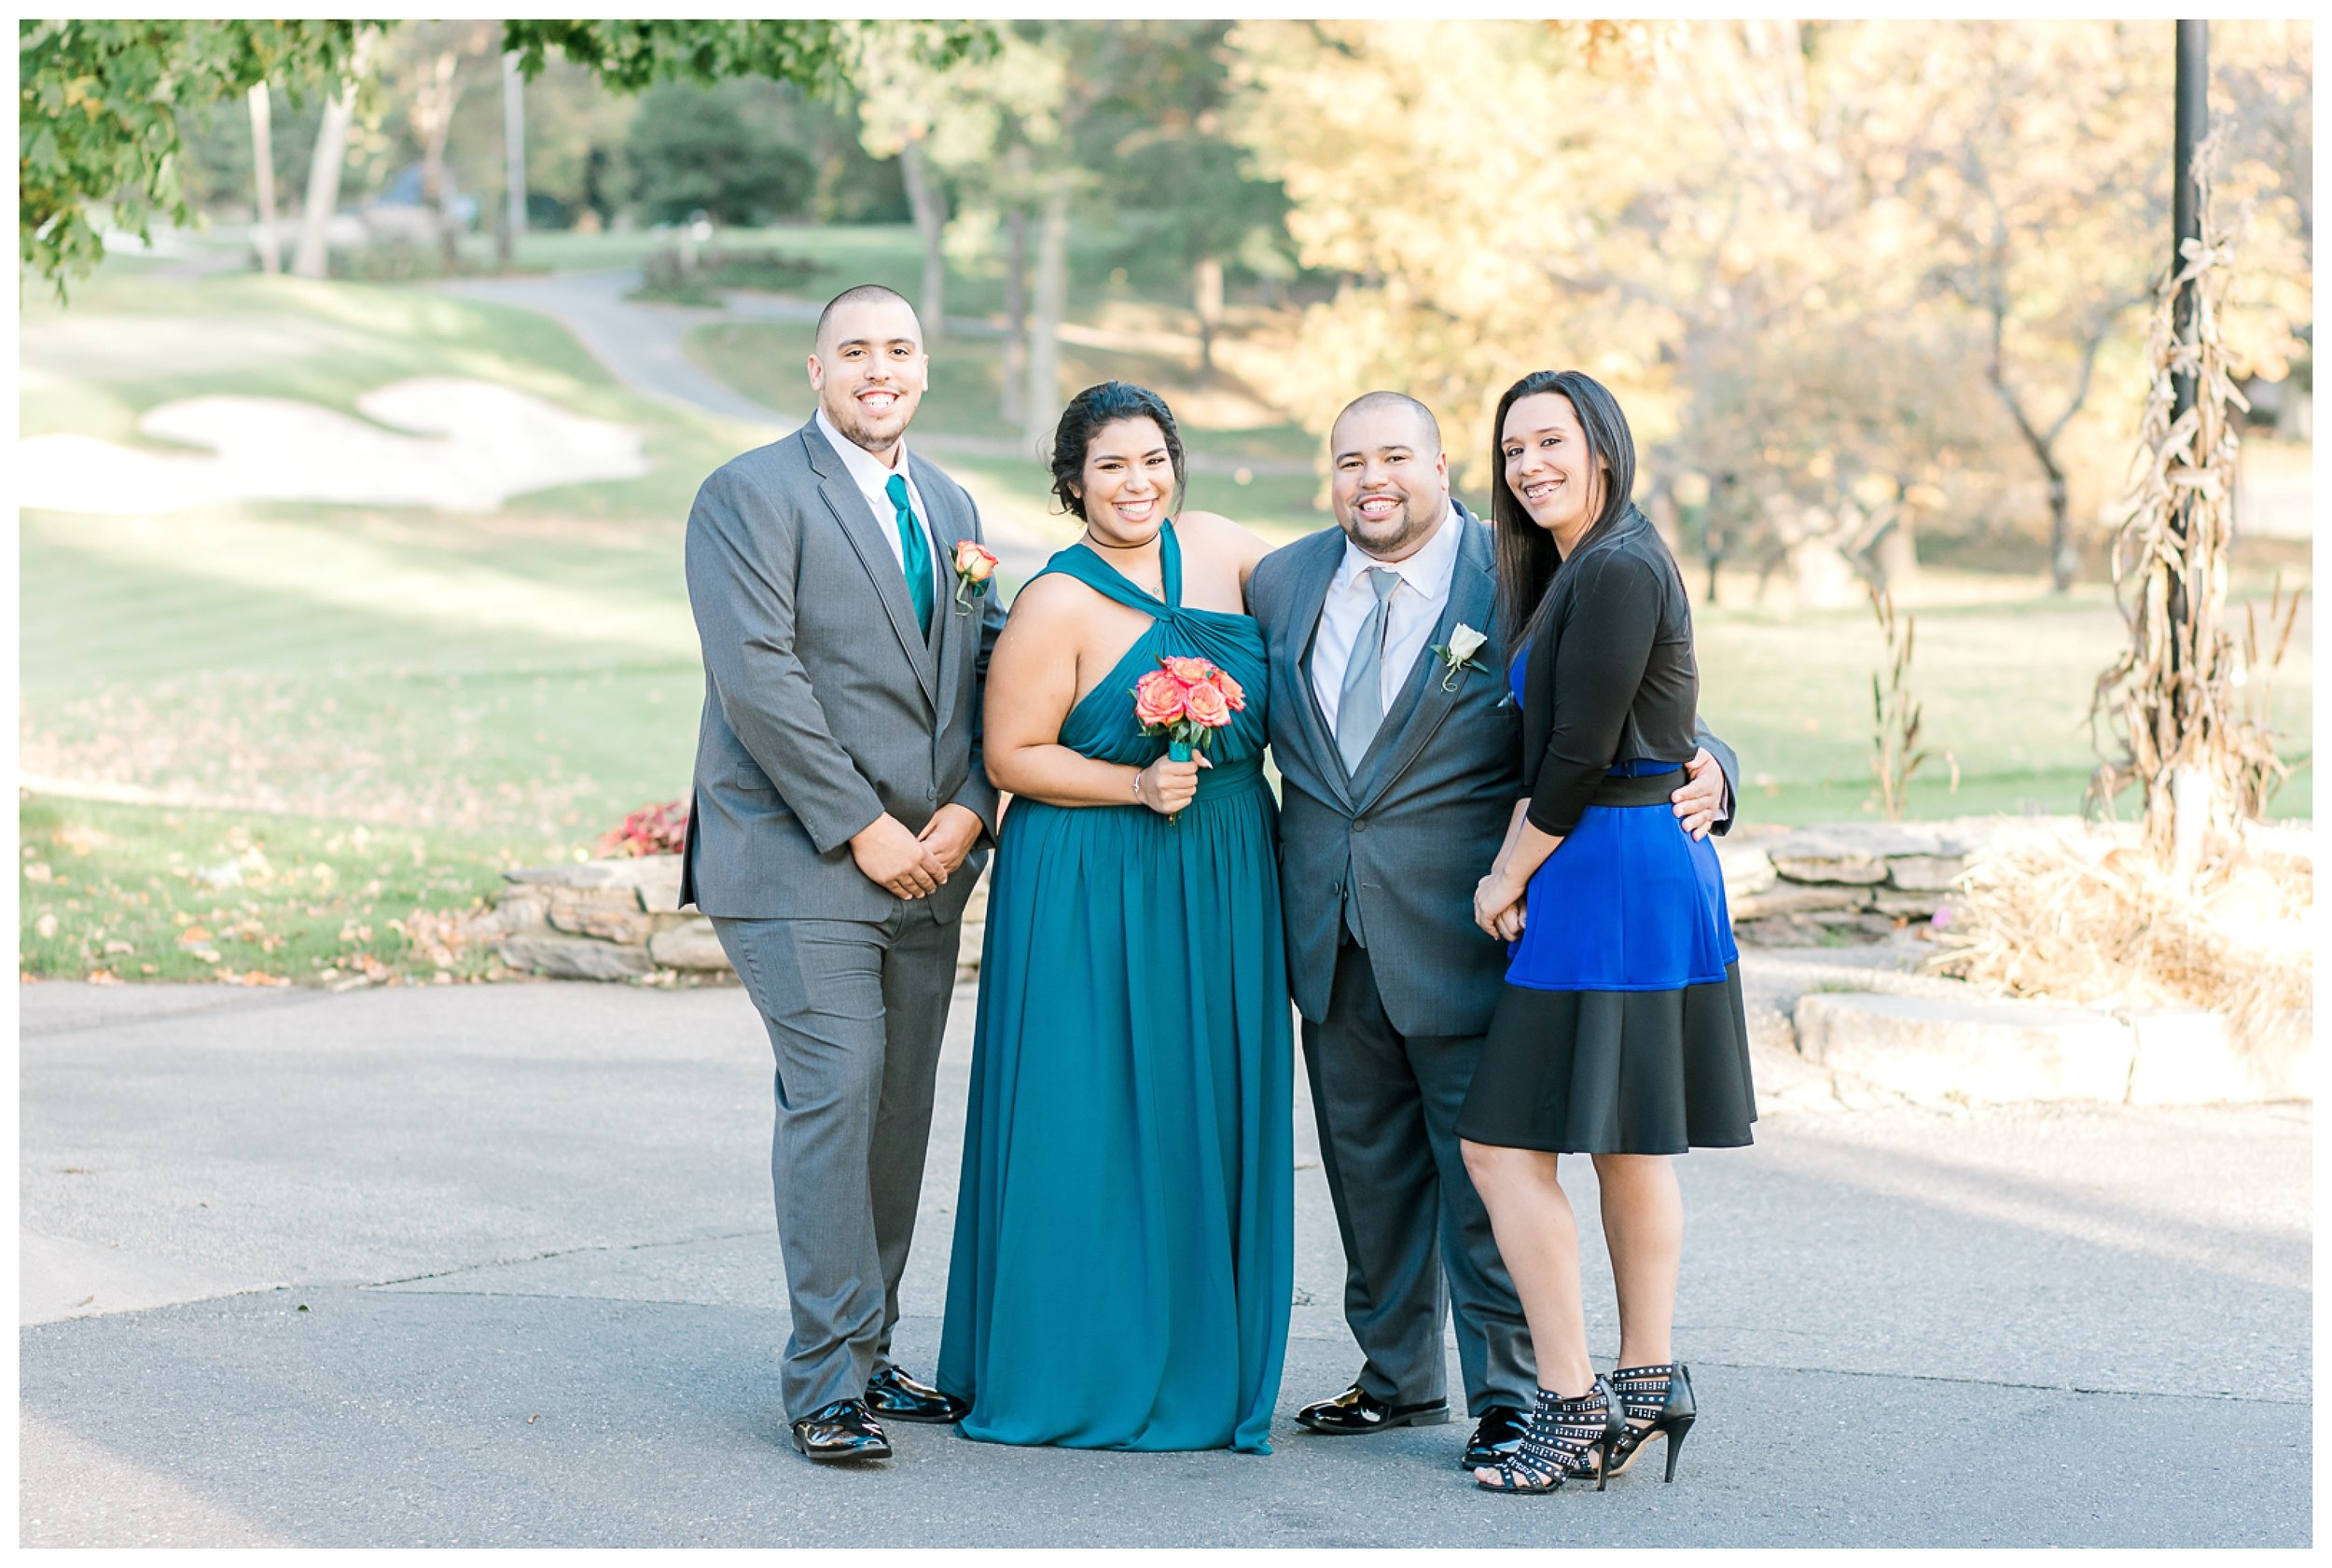 pleasant_valley_country_club_wedding_sutton_erica_pezente_photography (45).jpg